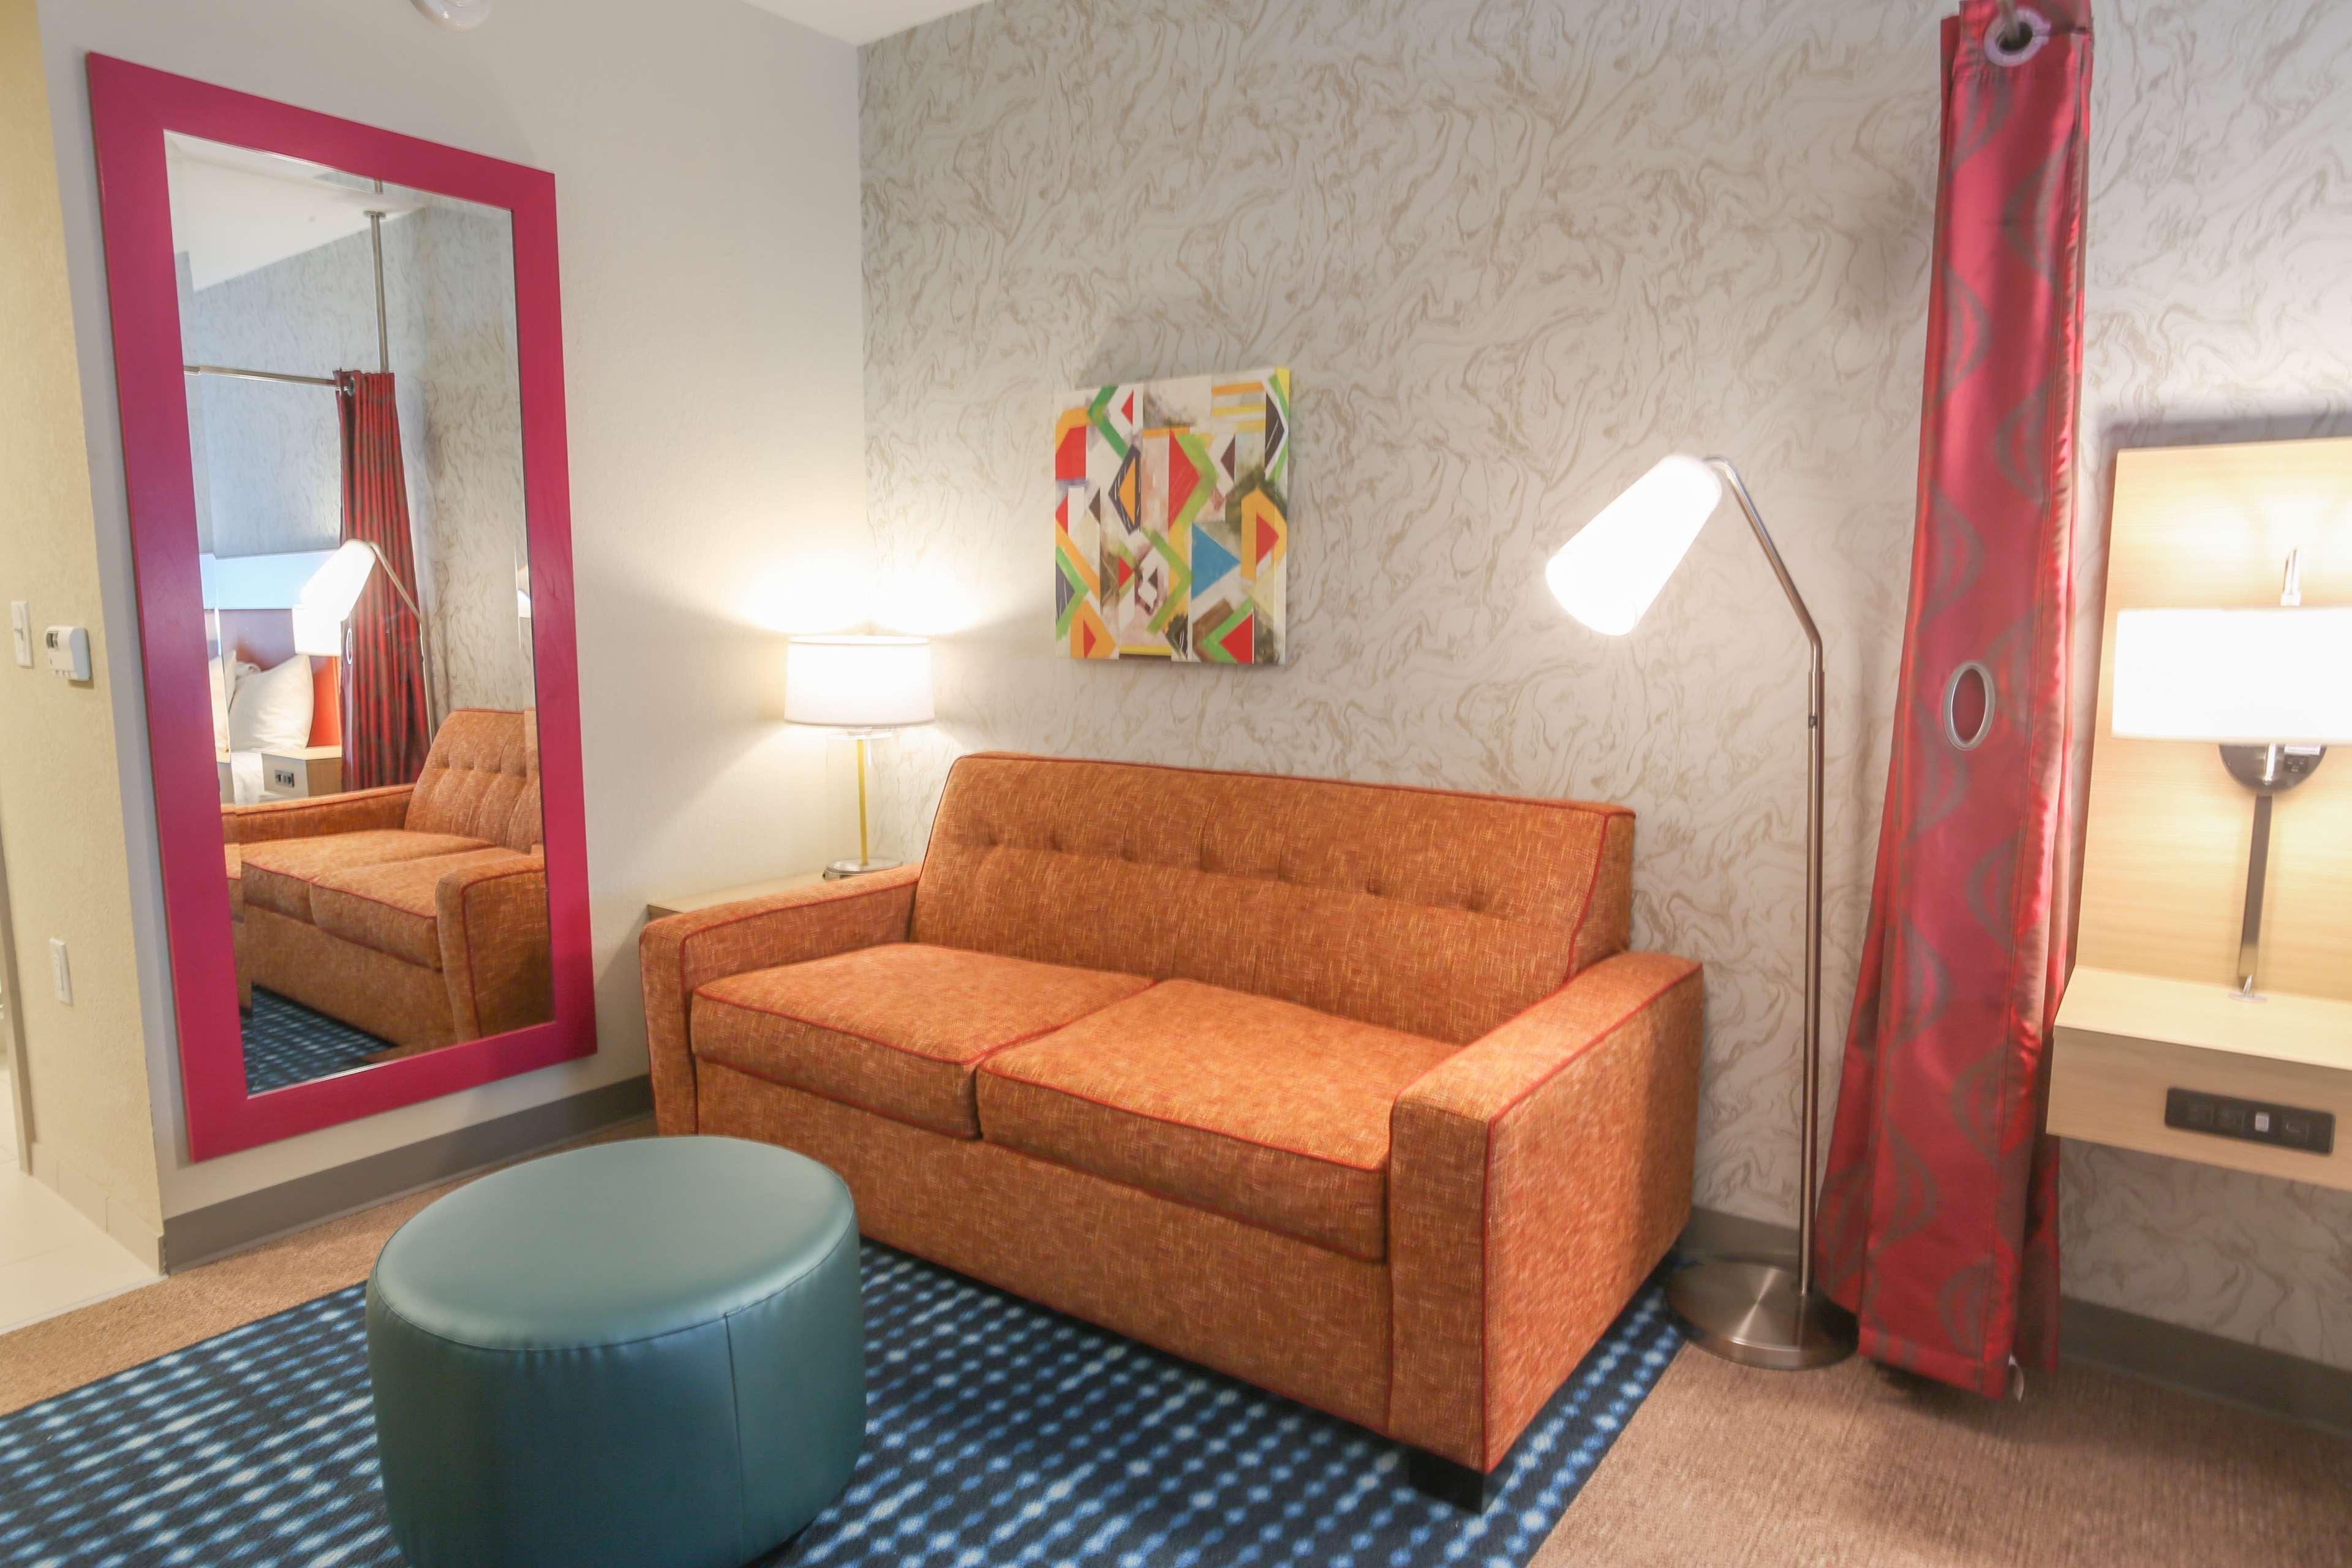 Home2 Suites by Hilton Bordentown image 27